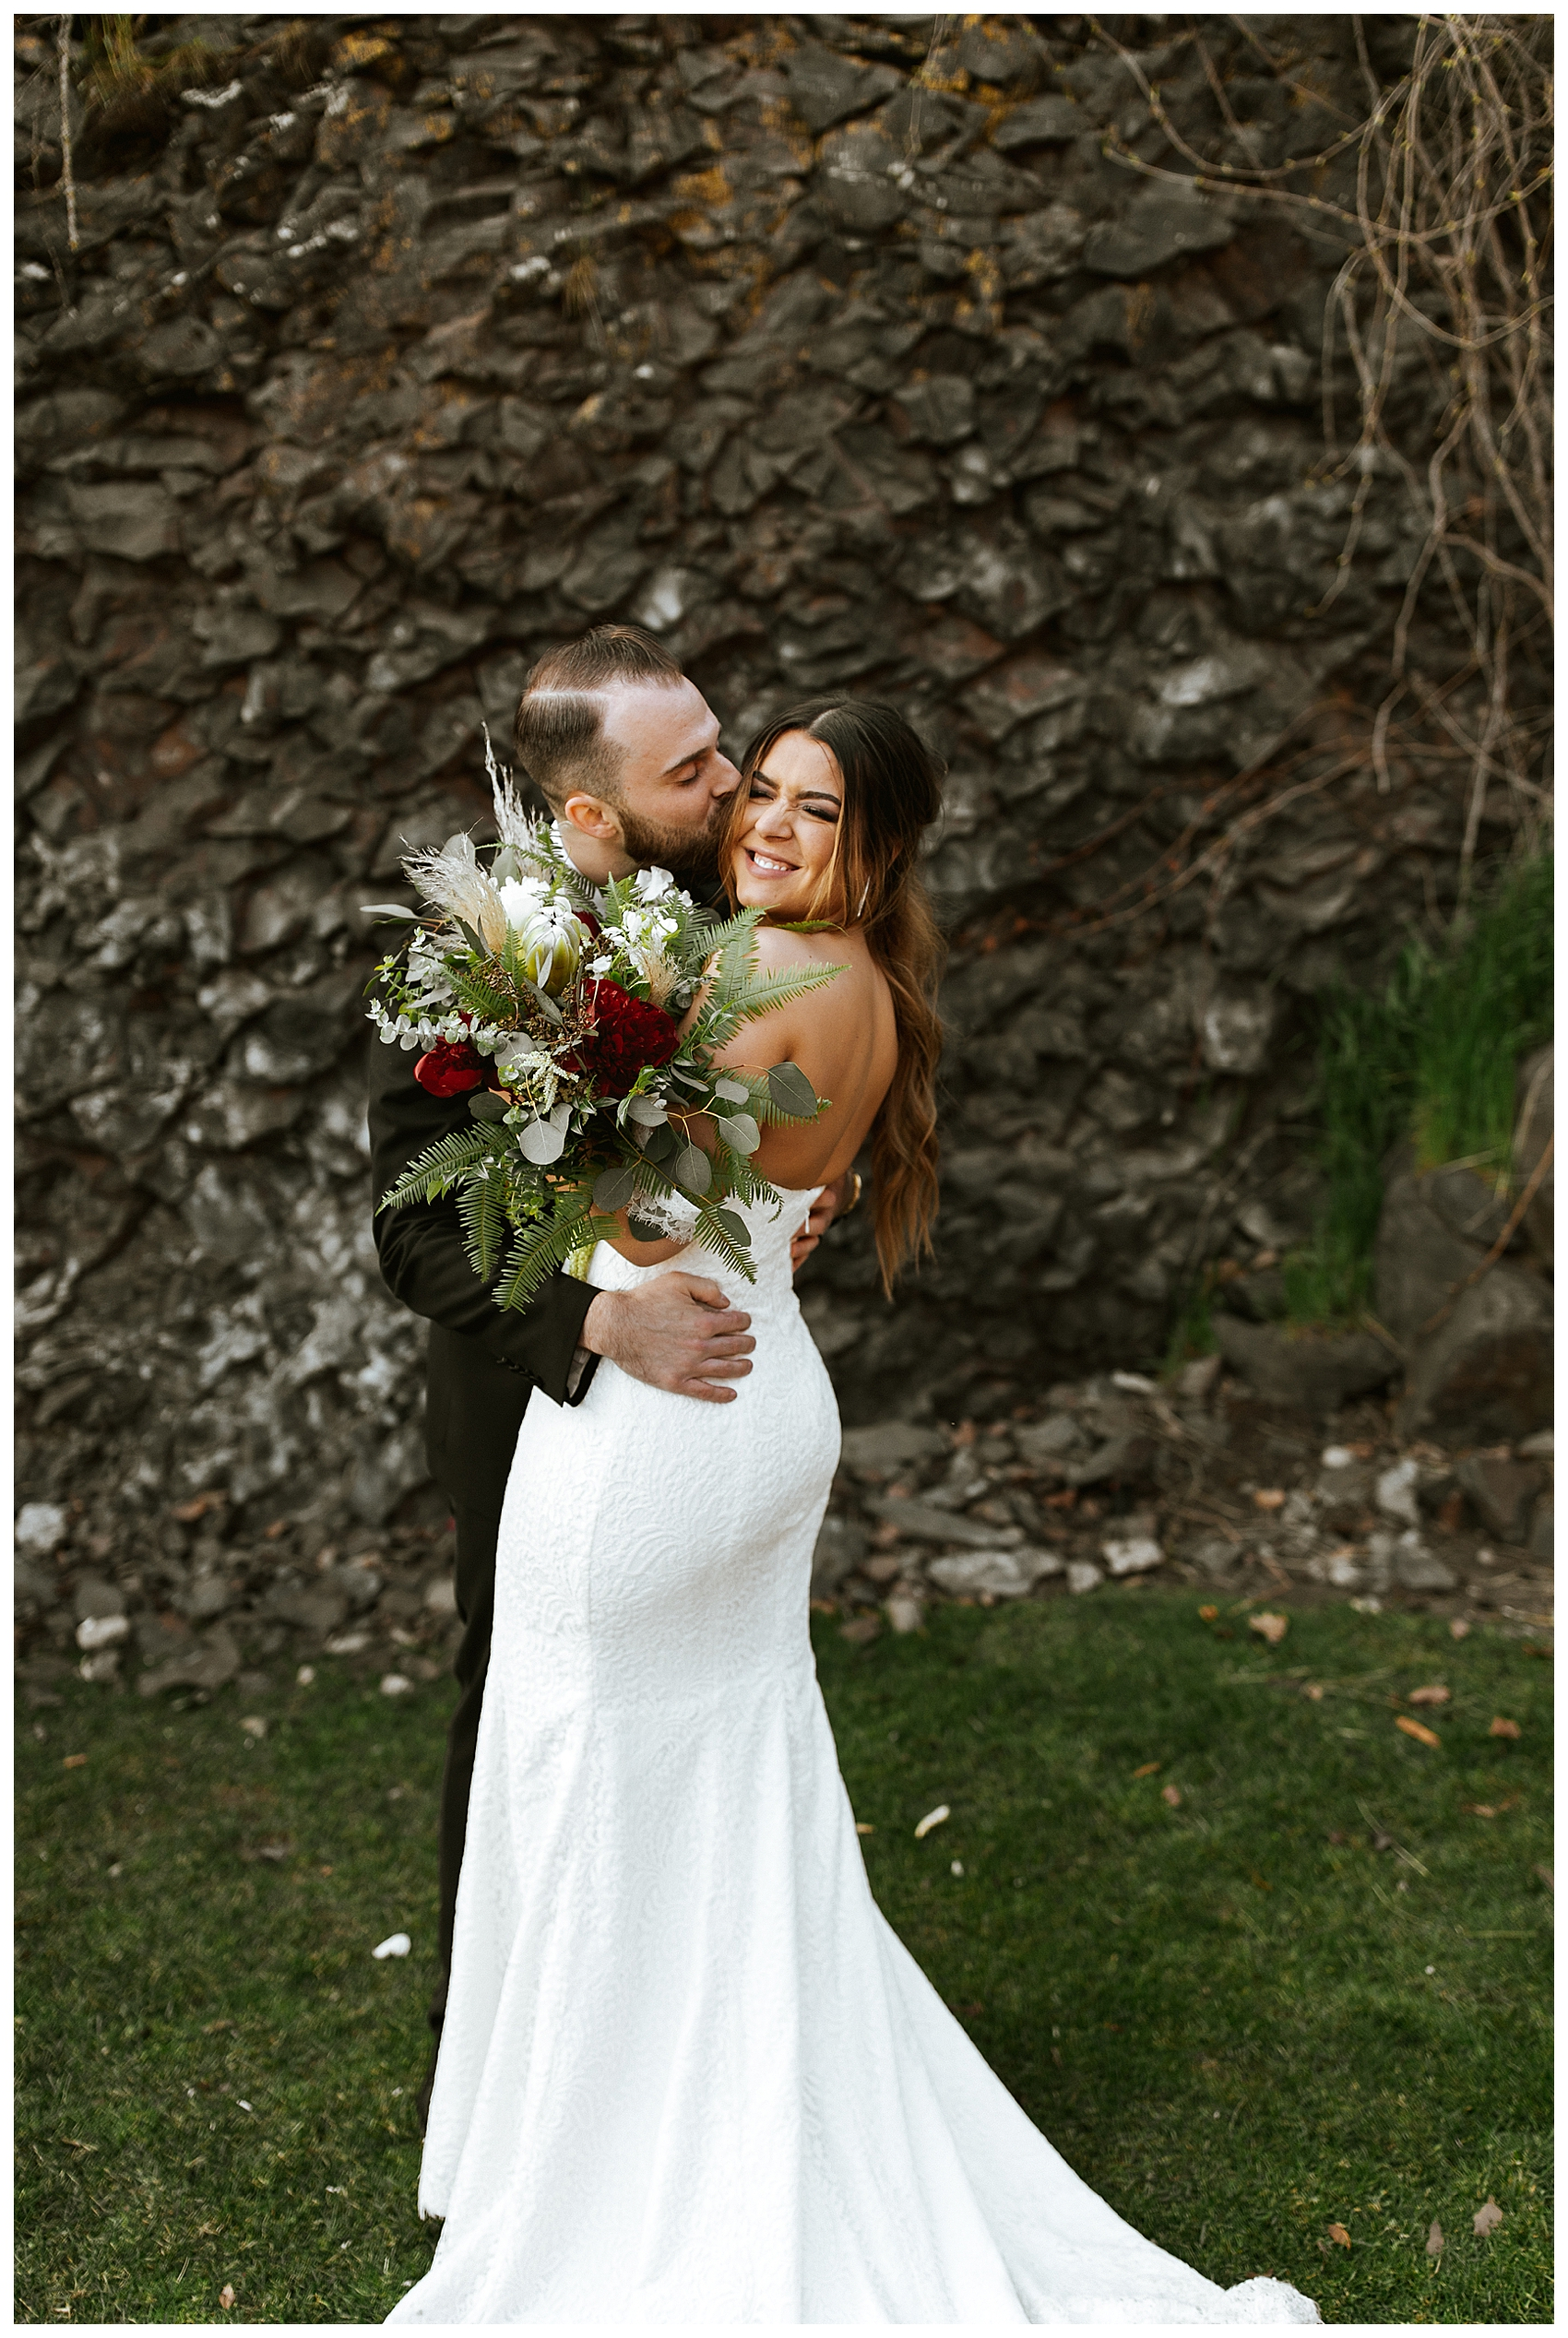 Chateau Rive Spokane Wedding Cassie Trottier Photography01079.jpg